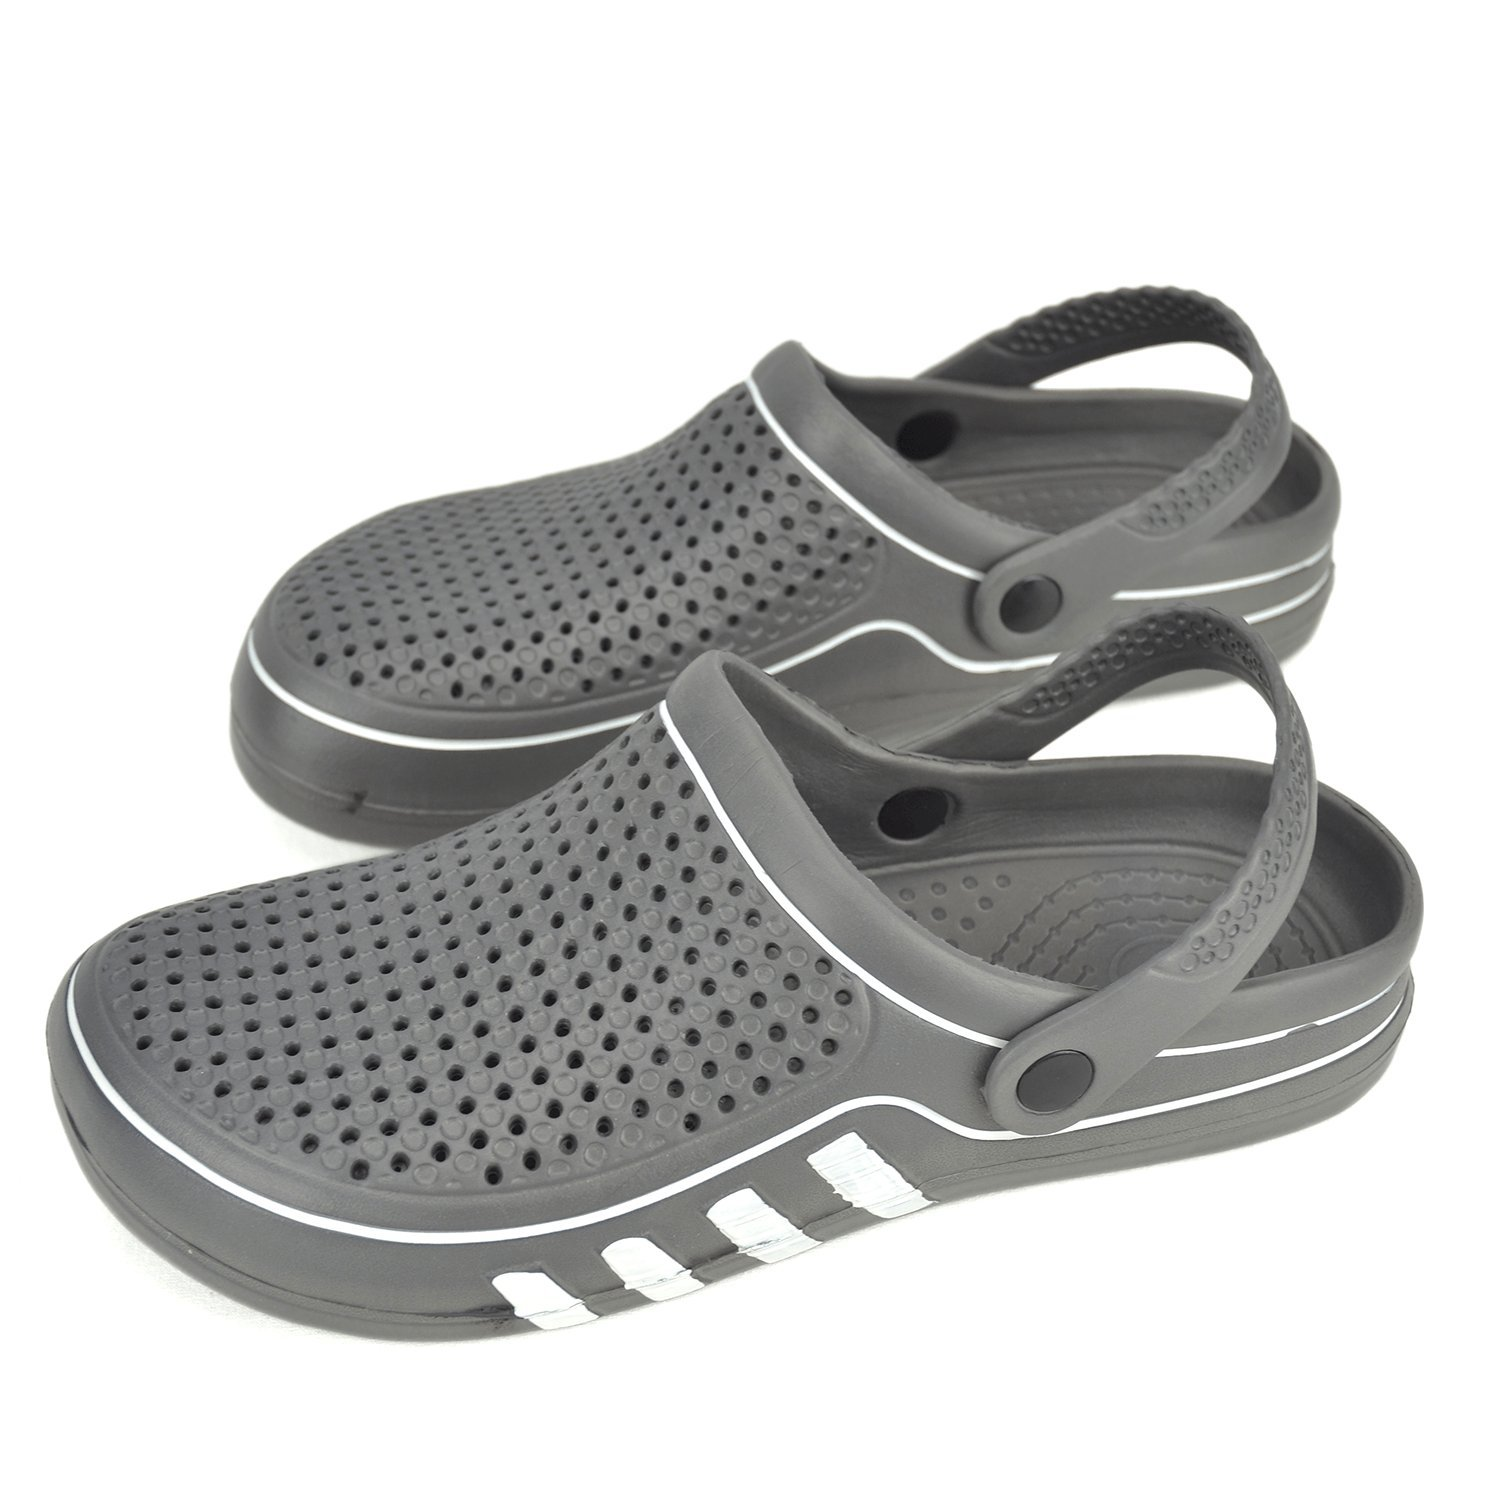 Lifekit Men Summer Clogs Antislip Sandals Garden Shoes Mules and Clogs Beach Pool Bathroom Breathable mesh Slippers